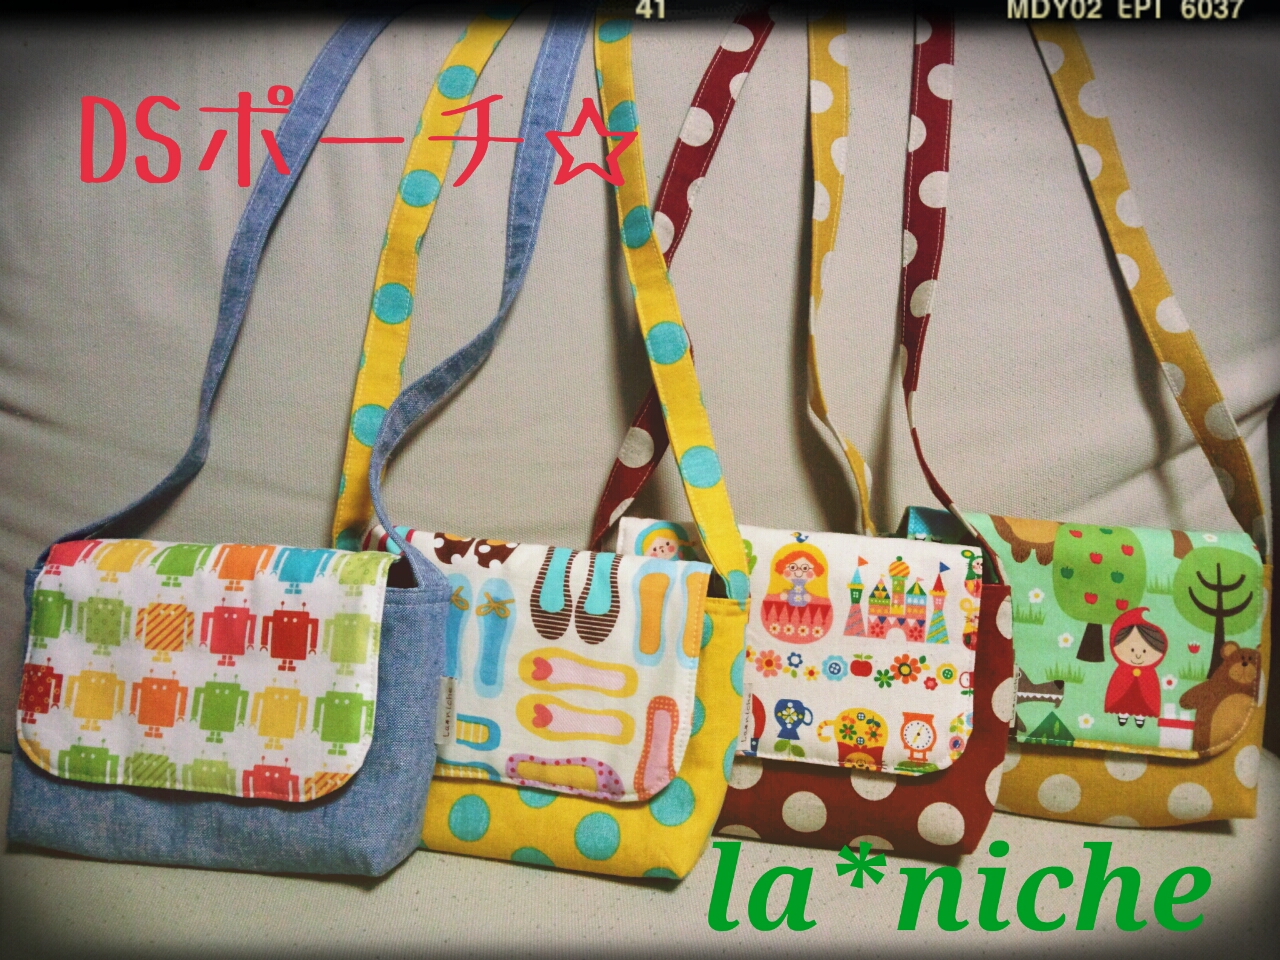 laniche51.jpg